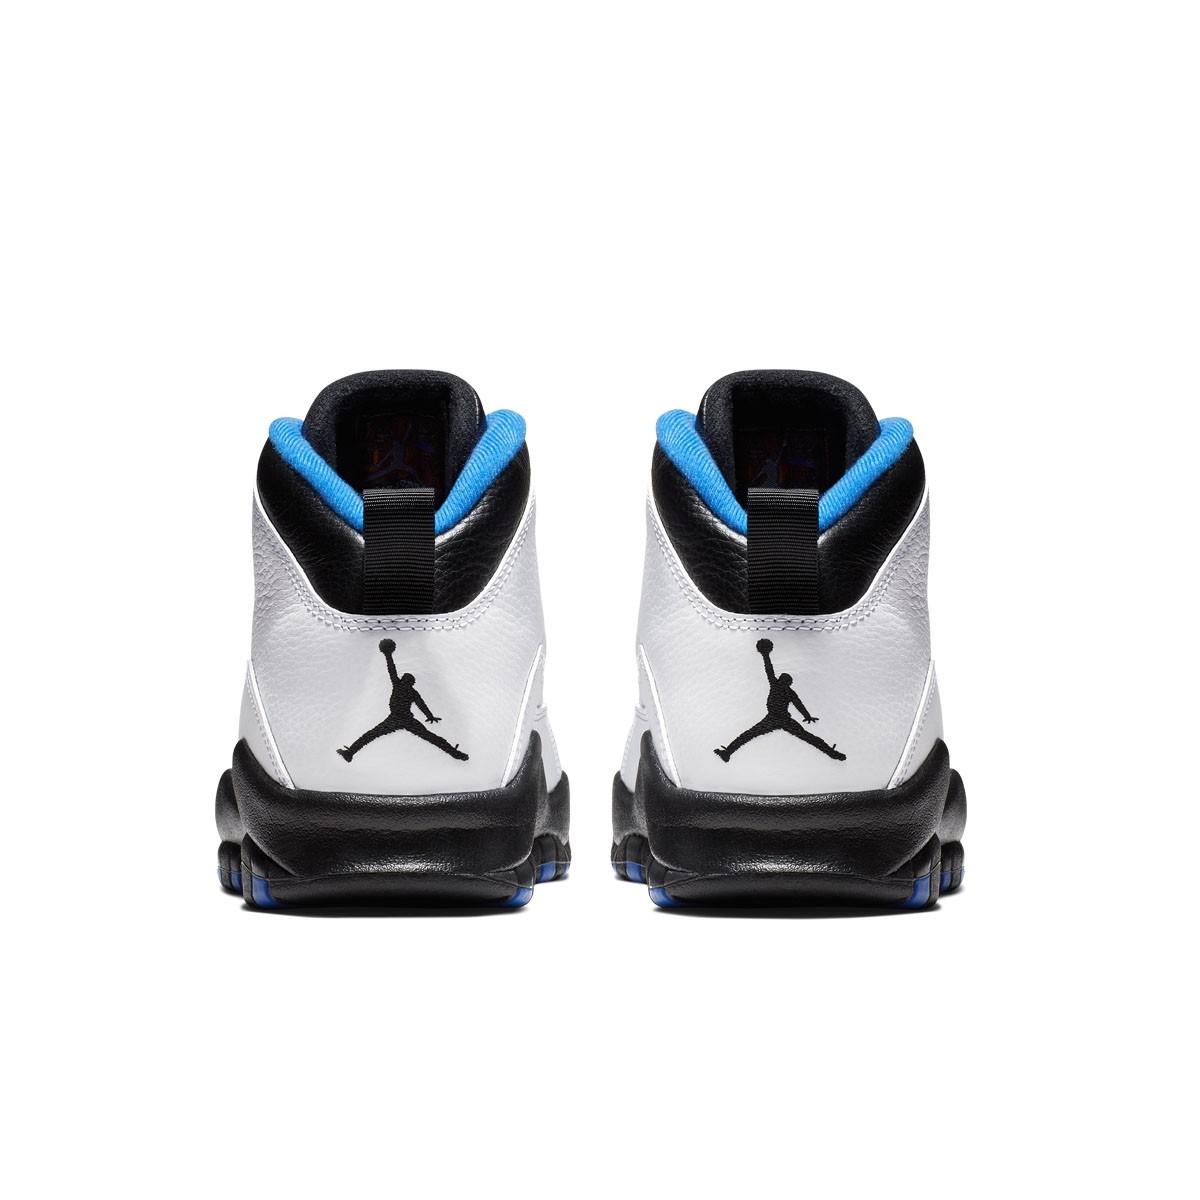 Air Jordan 10 Retro 'Orlando'  310805-108